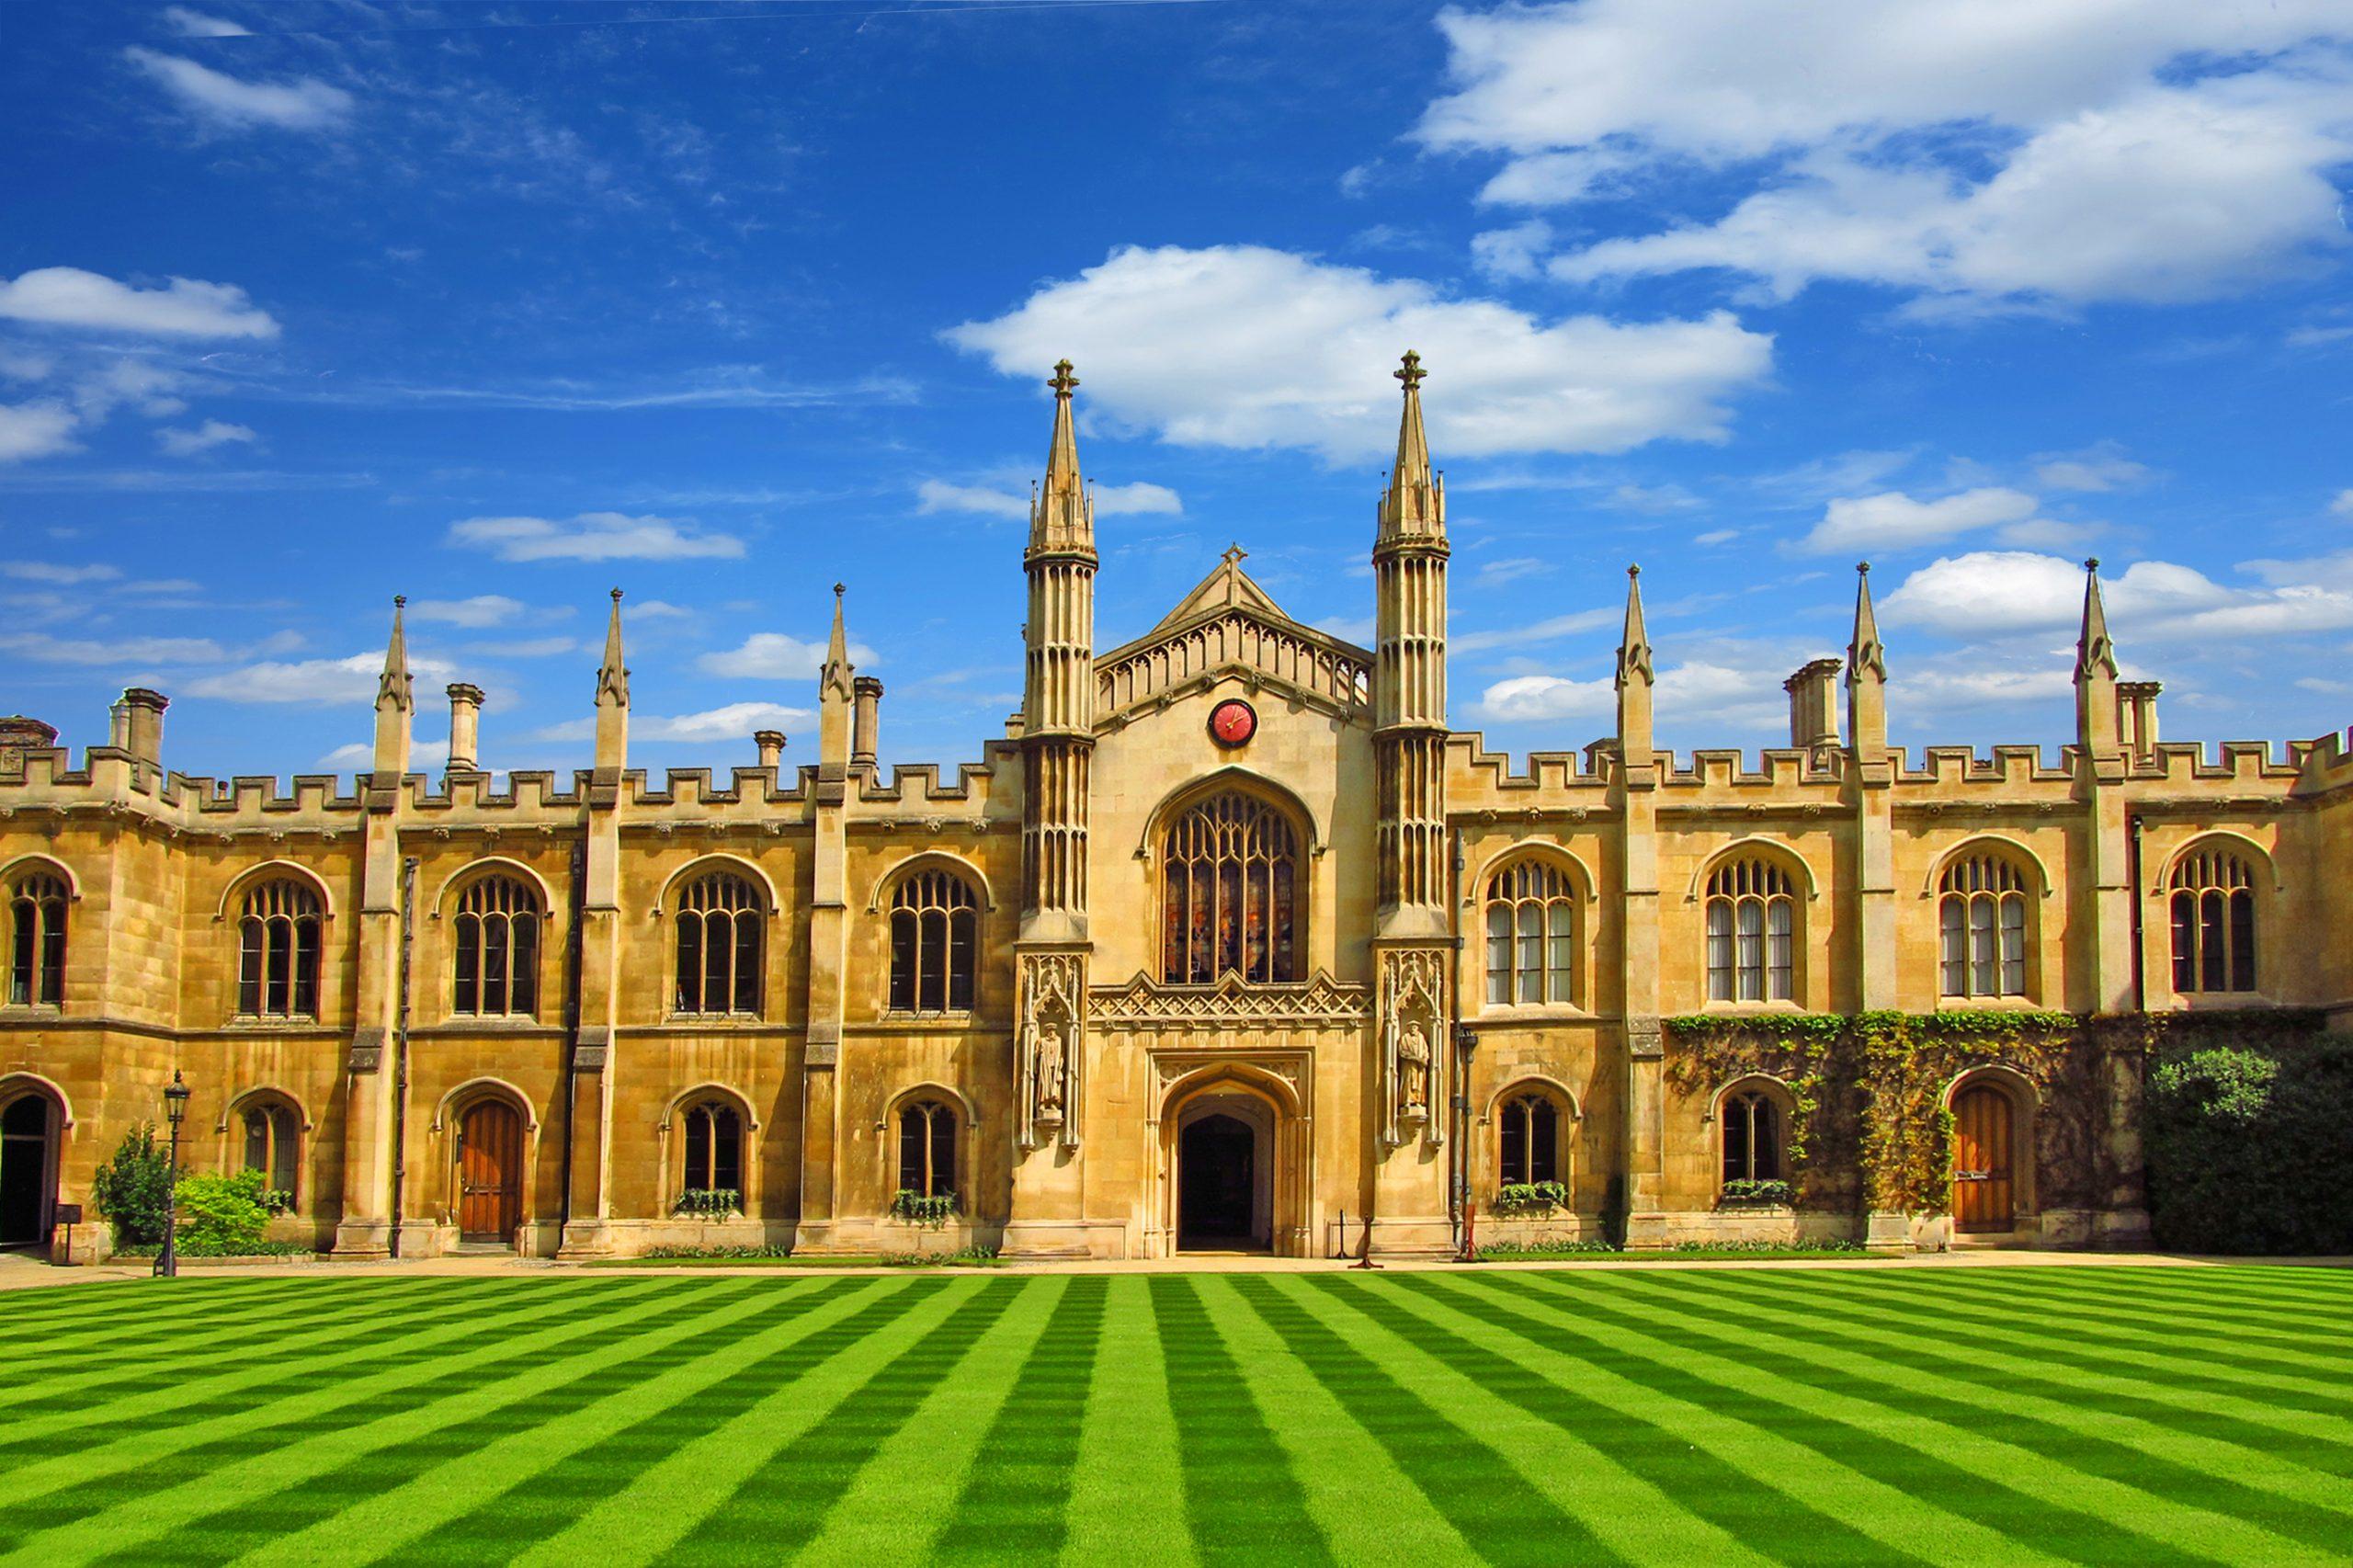 University of Cambridge Lawn